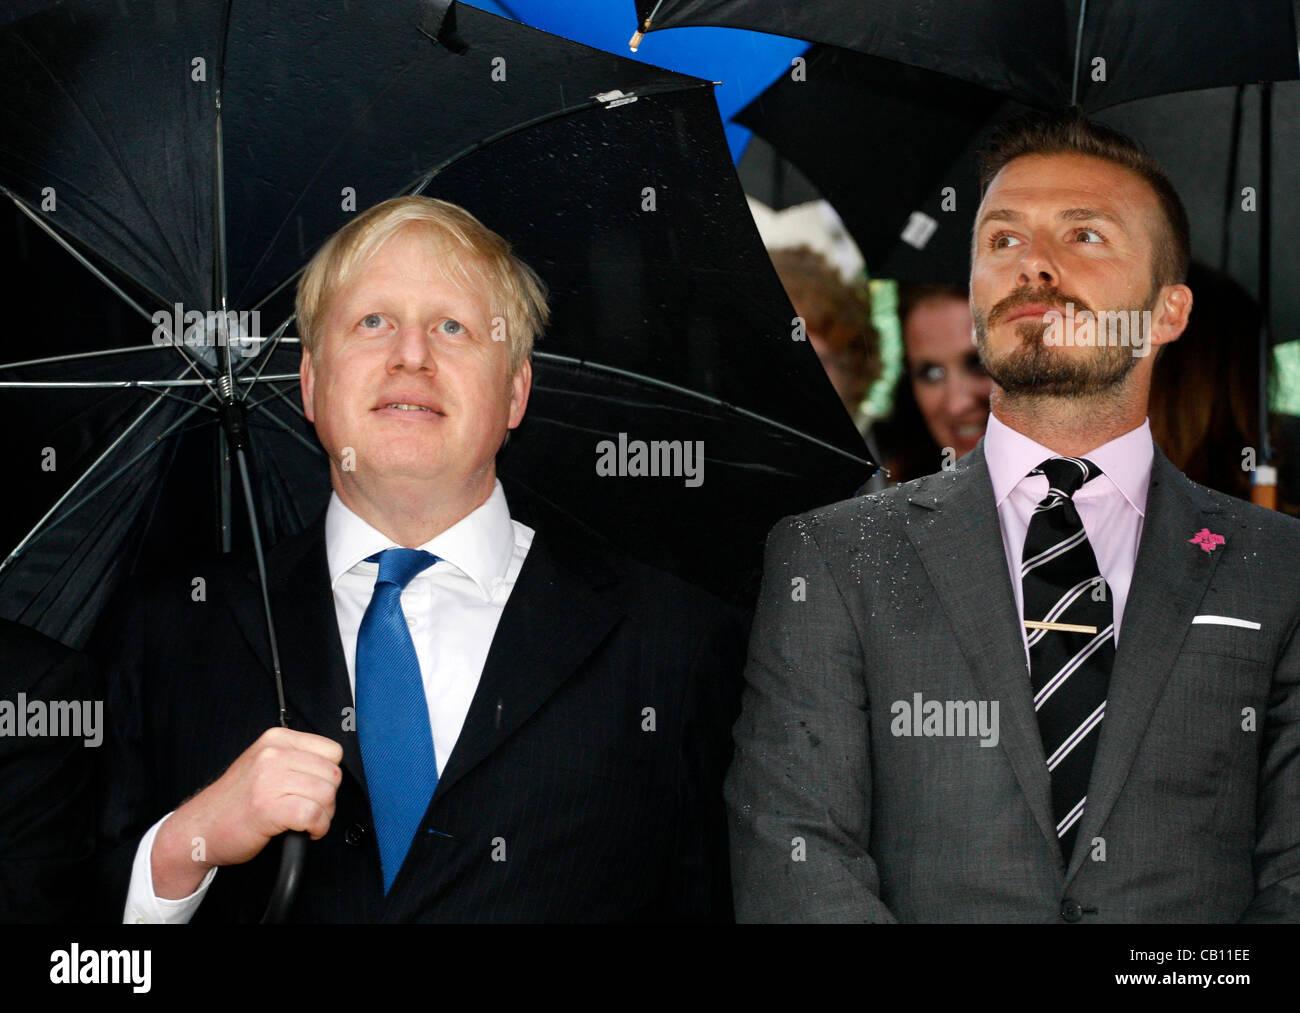 May 17 2012, Athens Greece. British soccer star DAVID BECKHAM and London's Mayor BORIS JOHNSON attend the Olympic - Stock Image